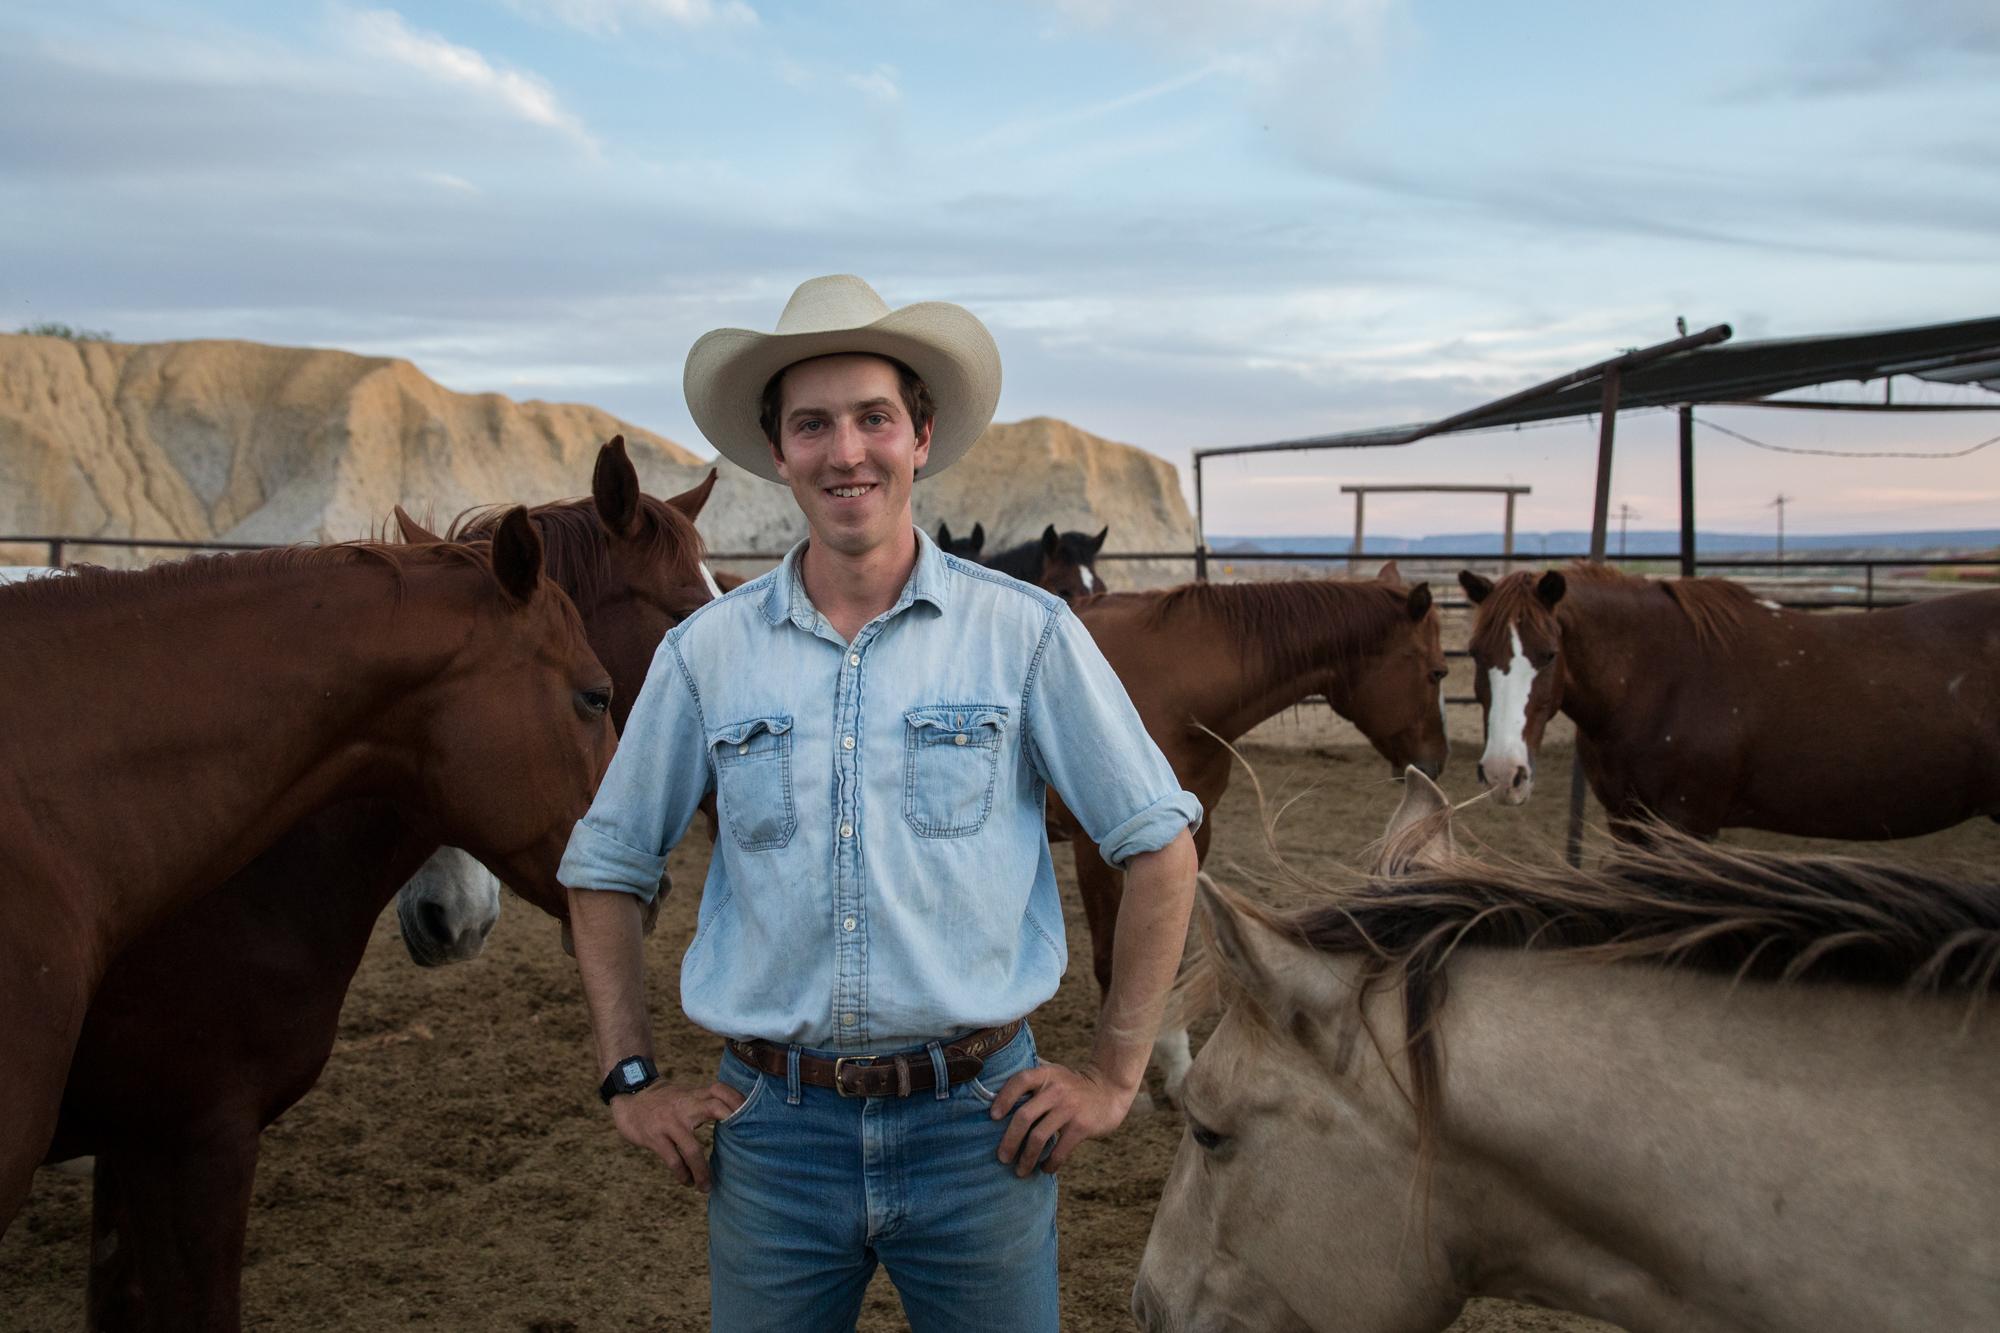 LOG_Texas_Cowboy_0001.jpg